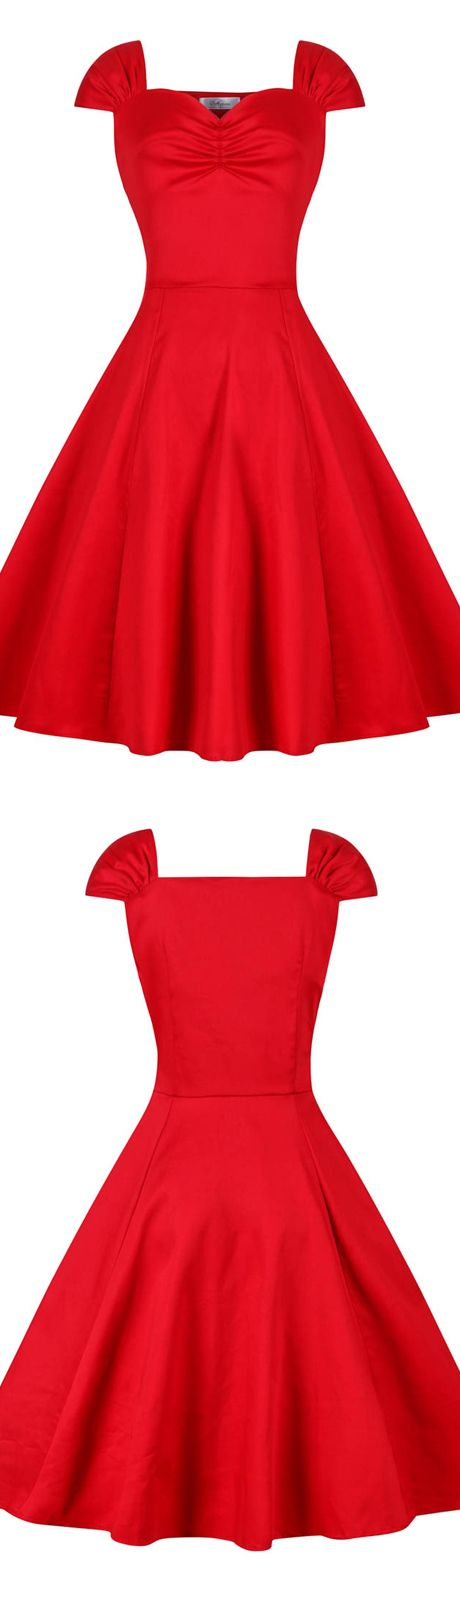 Best 25  Vintage red dress ideas on Pinterest | 1950s fashion ...